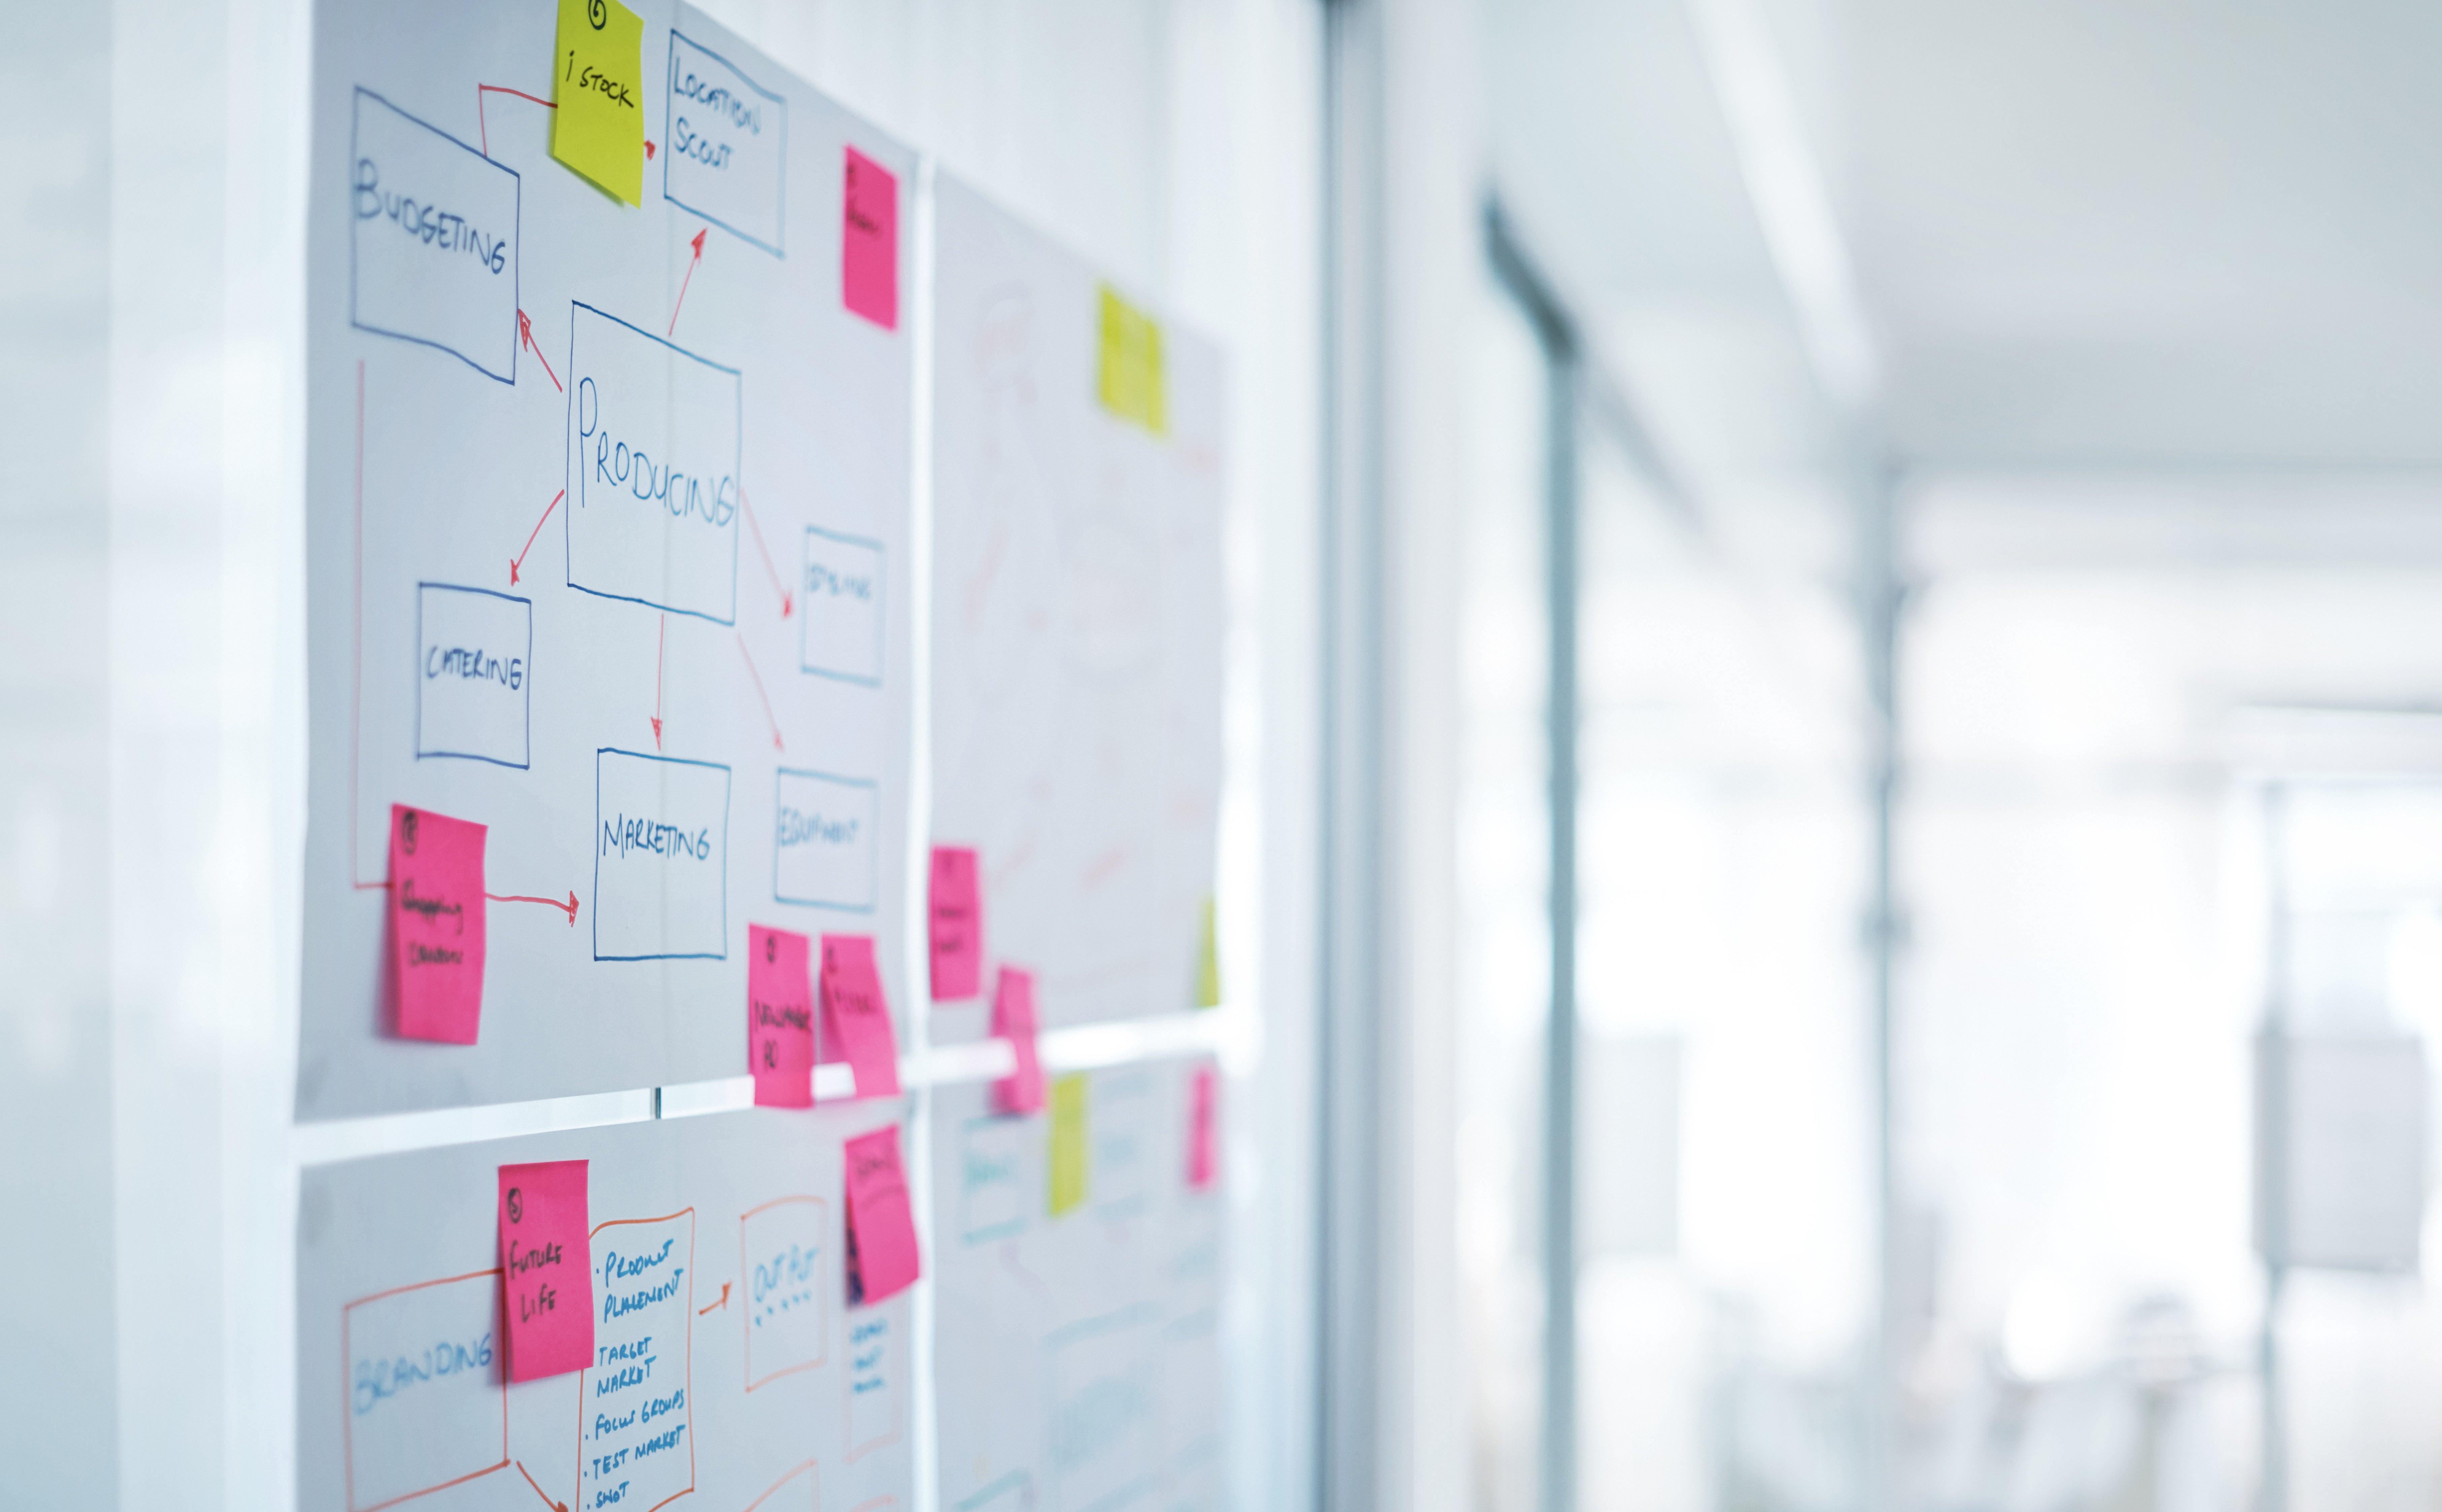 Marketing workflow with sticky note